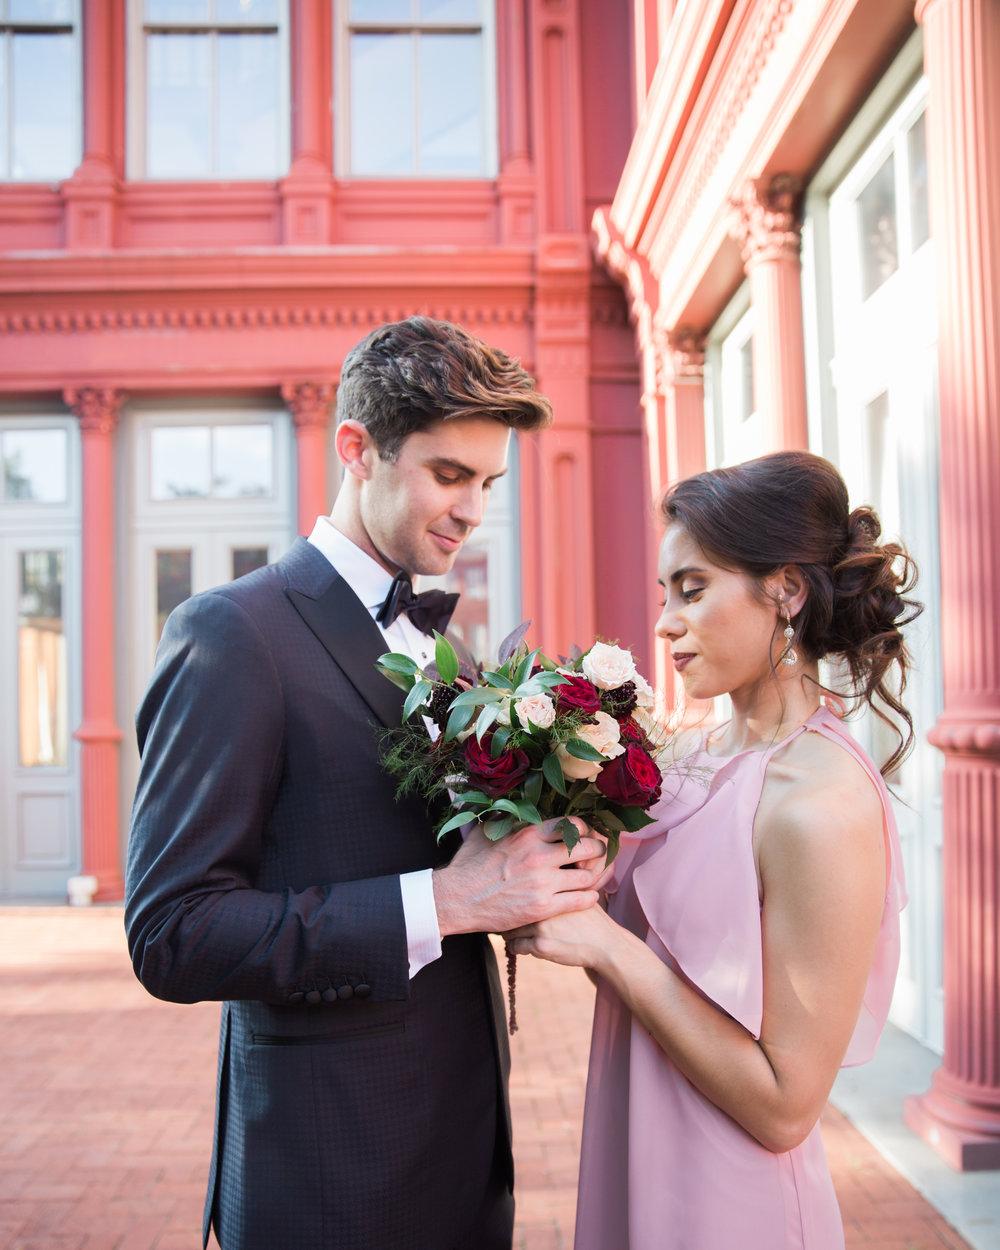 Top Stylish Baltimore Wedding 1840's Plaza Megapixels Media Photography-31.jpg